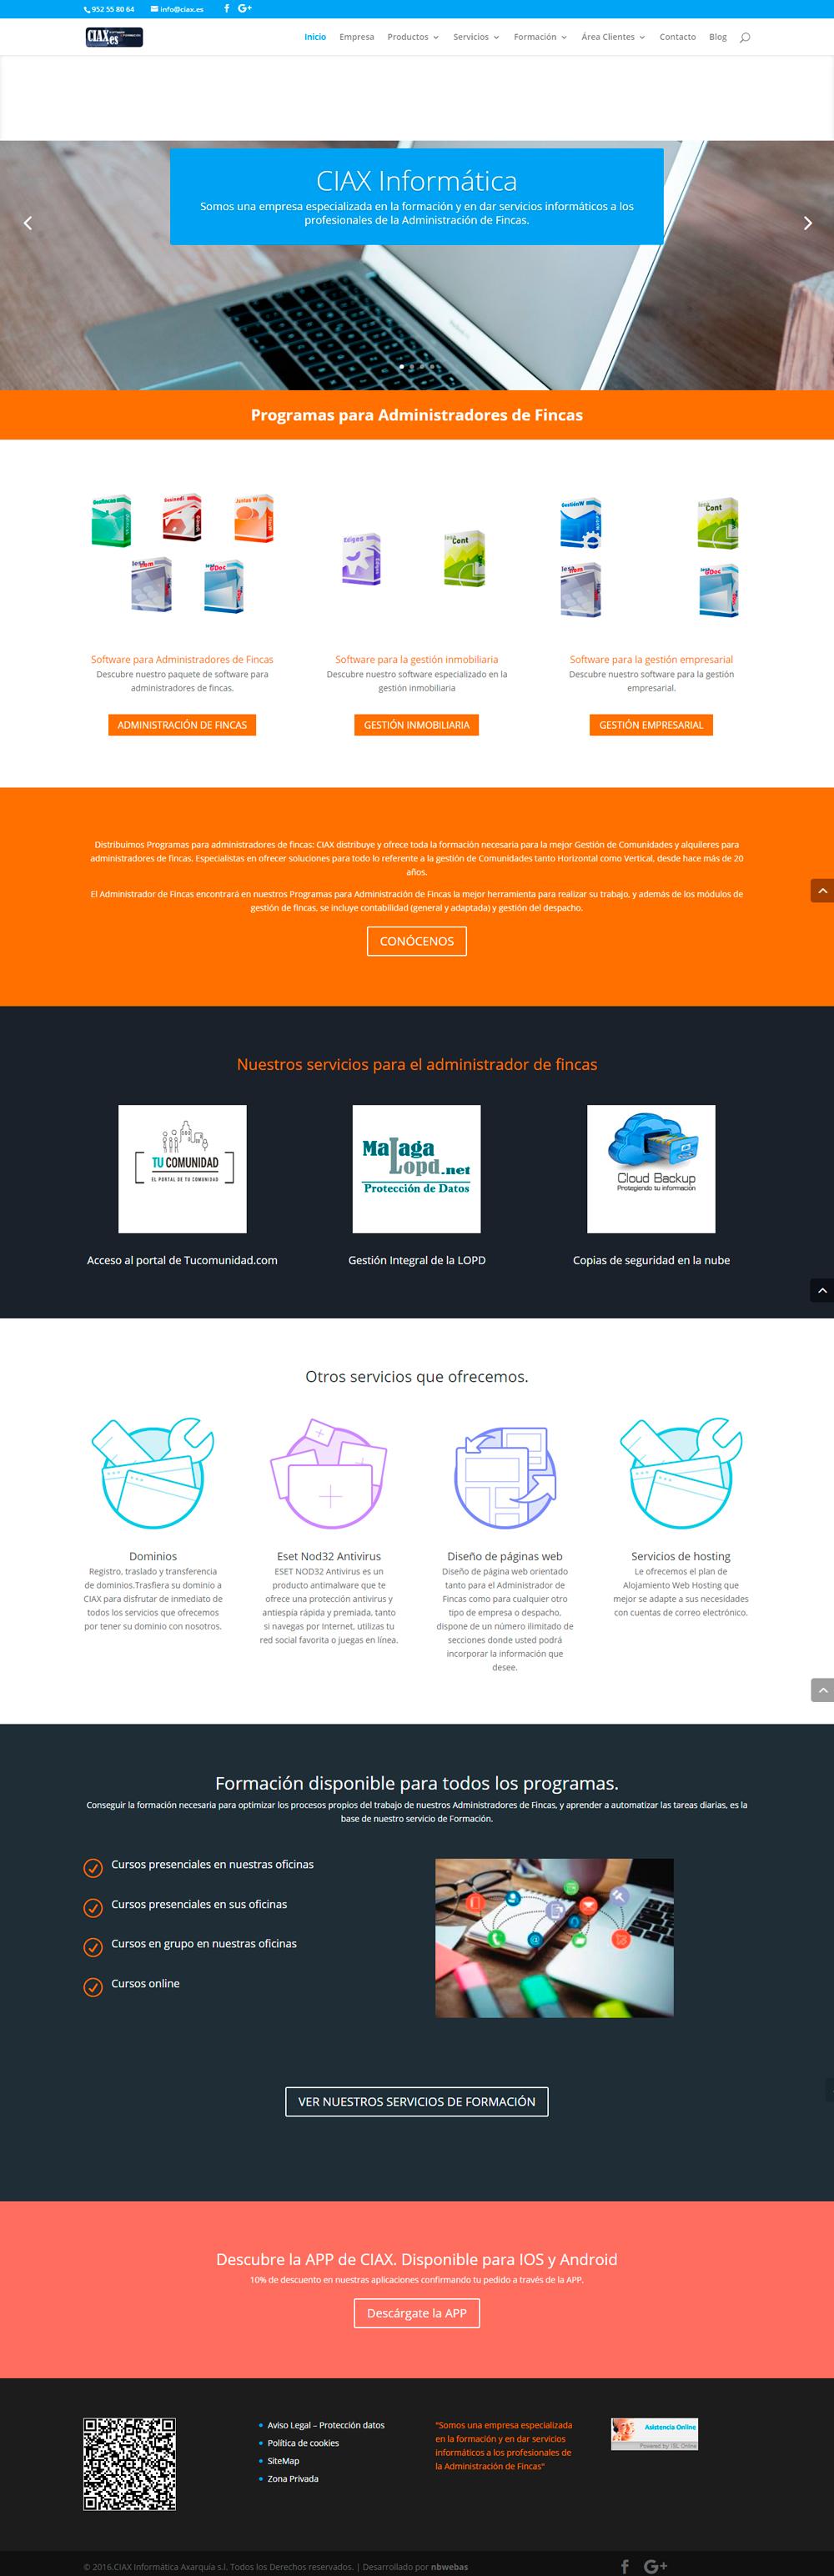 web responsive para ciax